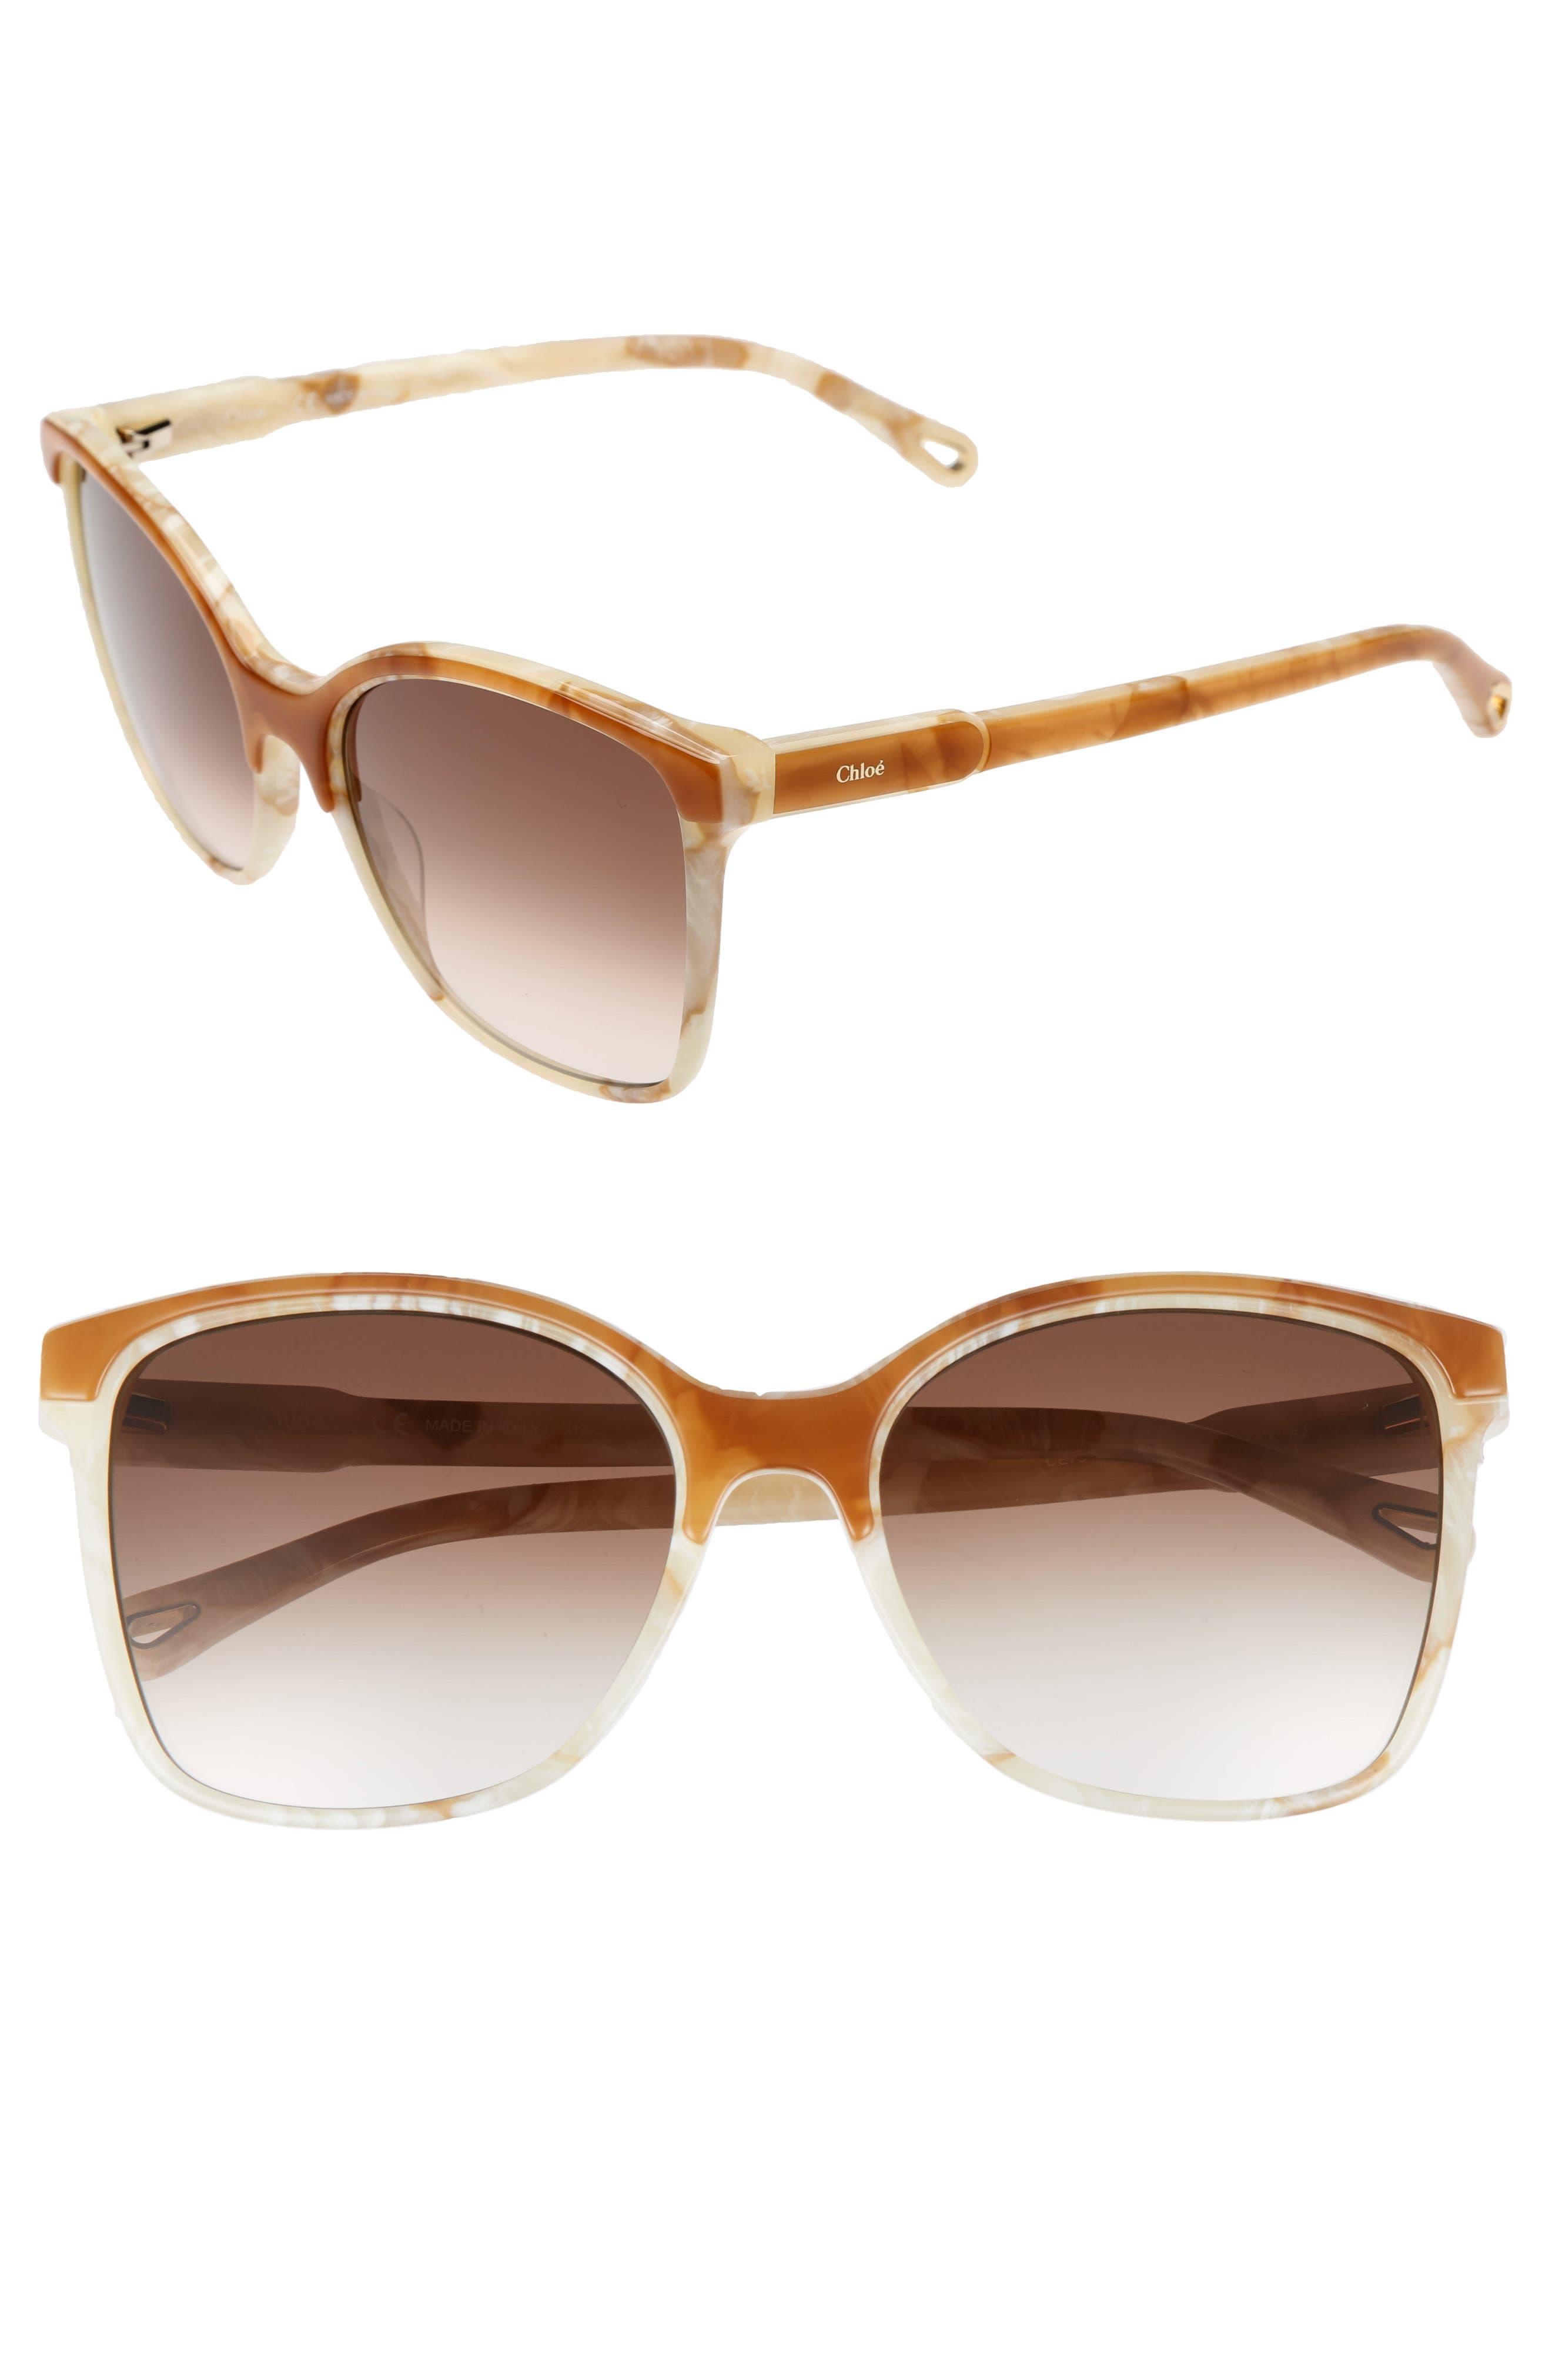 Main Image - Chloé 59mm Brow Bar Sunglasses